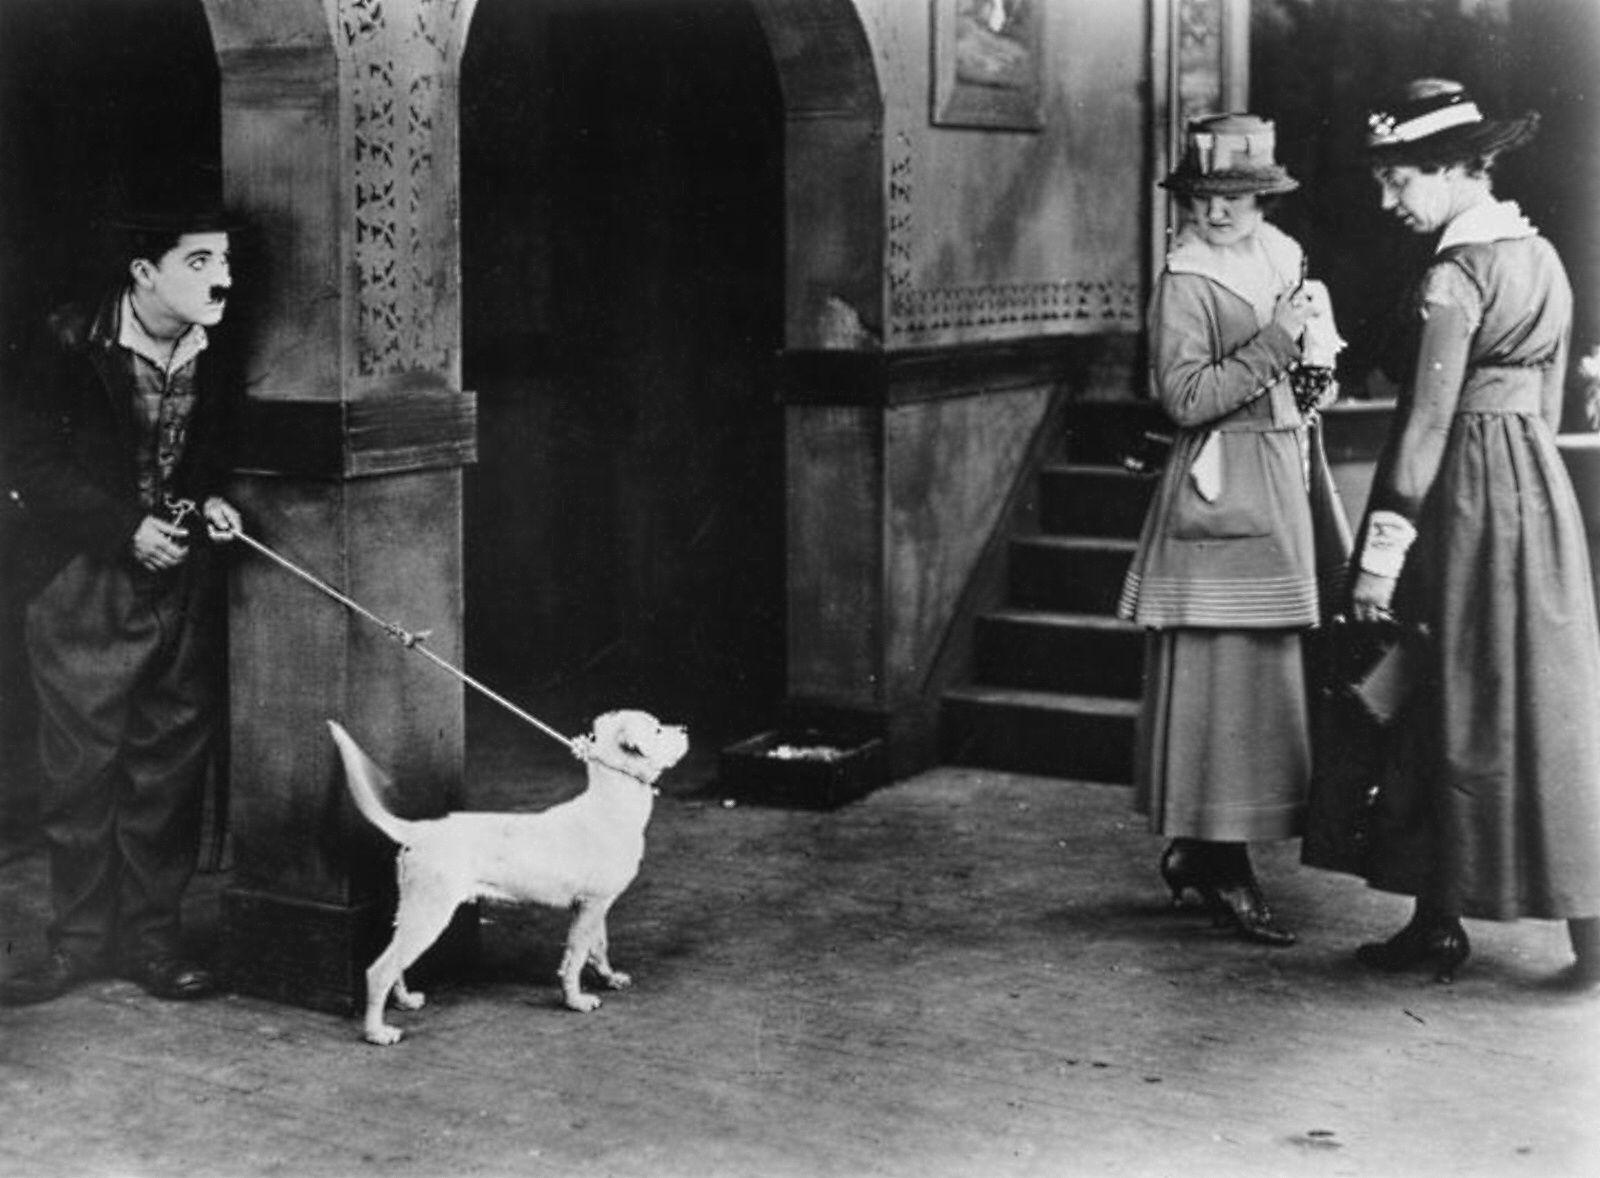 Pin Von ольга антонова Auf Charlie Chaplin